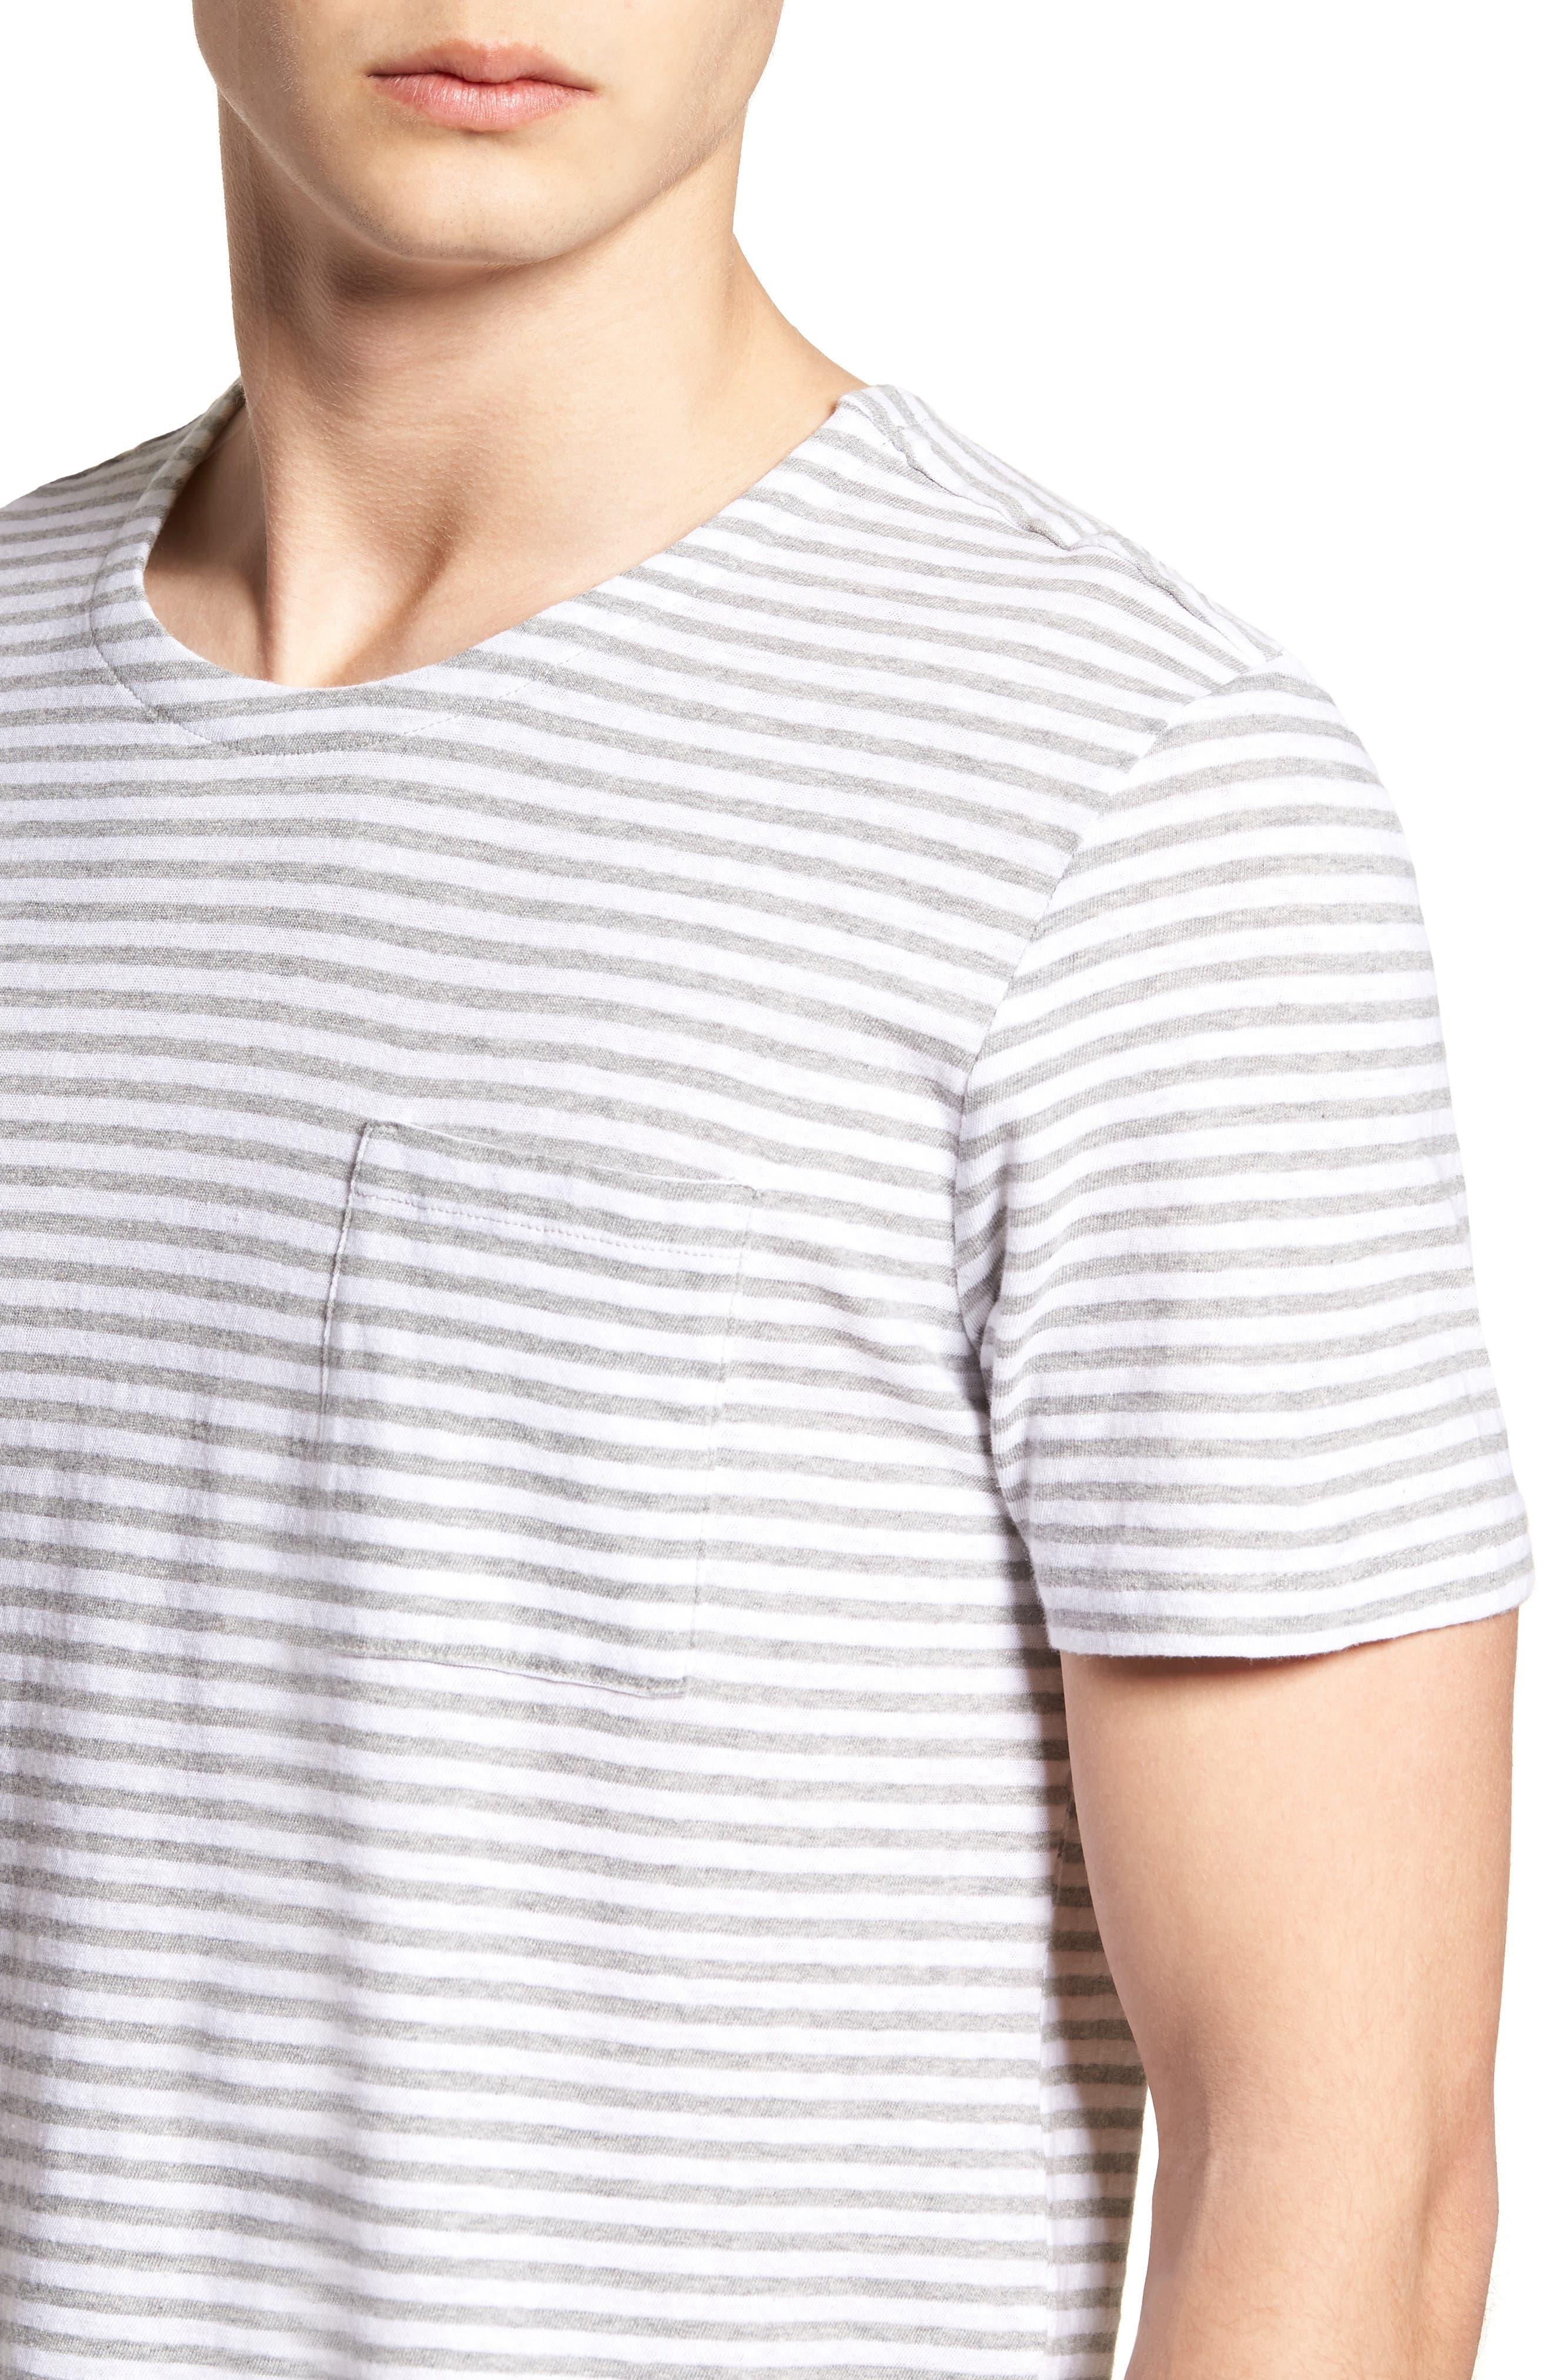 & Bros. Stripe Crewneck T-Shirt,                             Alternate thumbnail 4, color,                             WHITE STRIPE